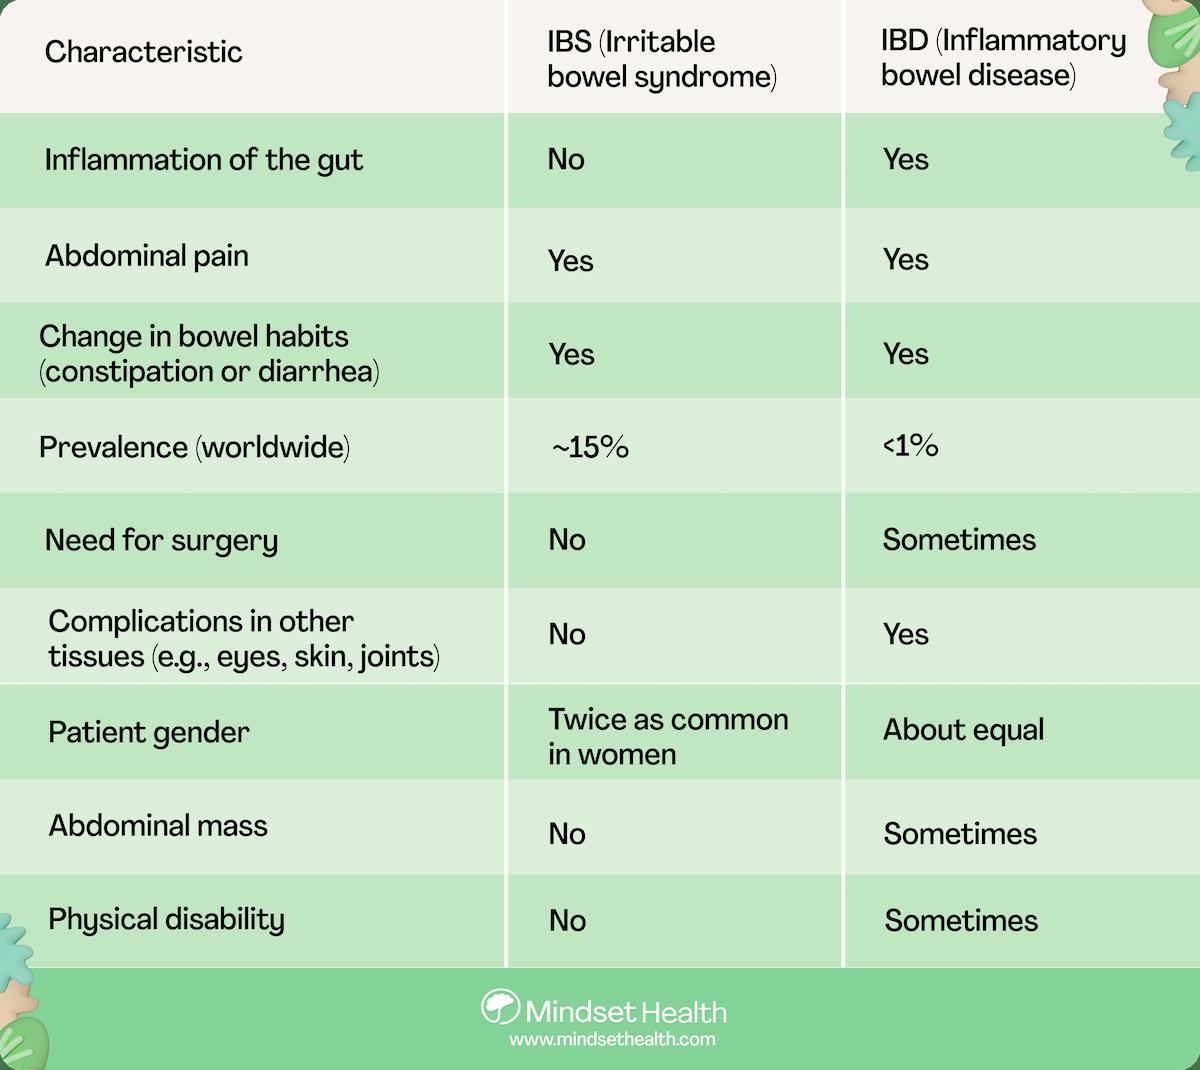 IBS vs IBD chart